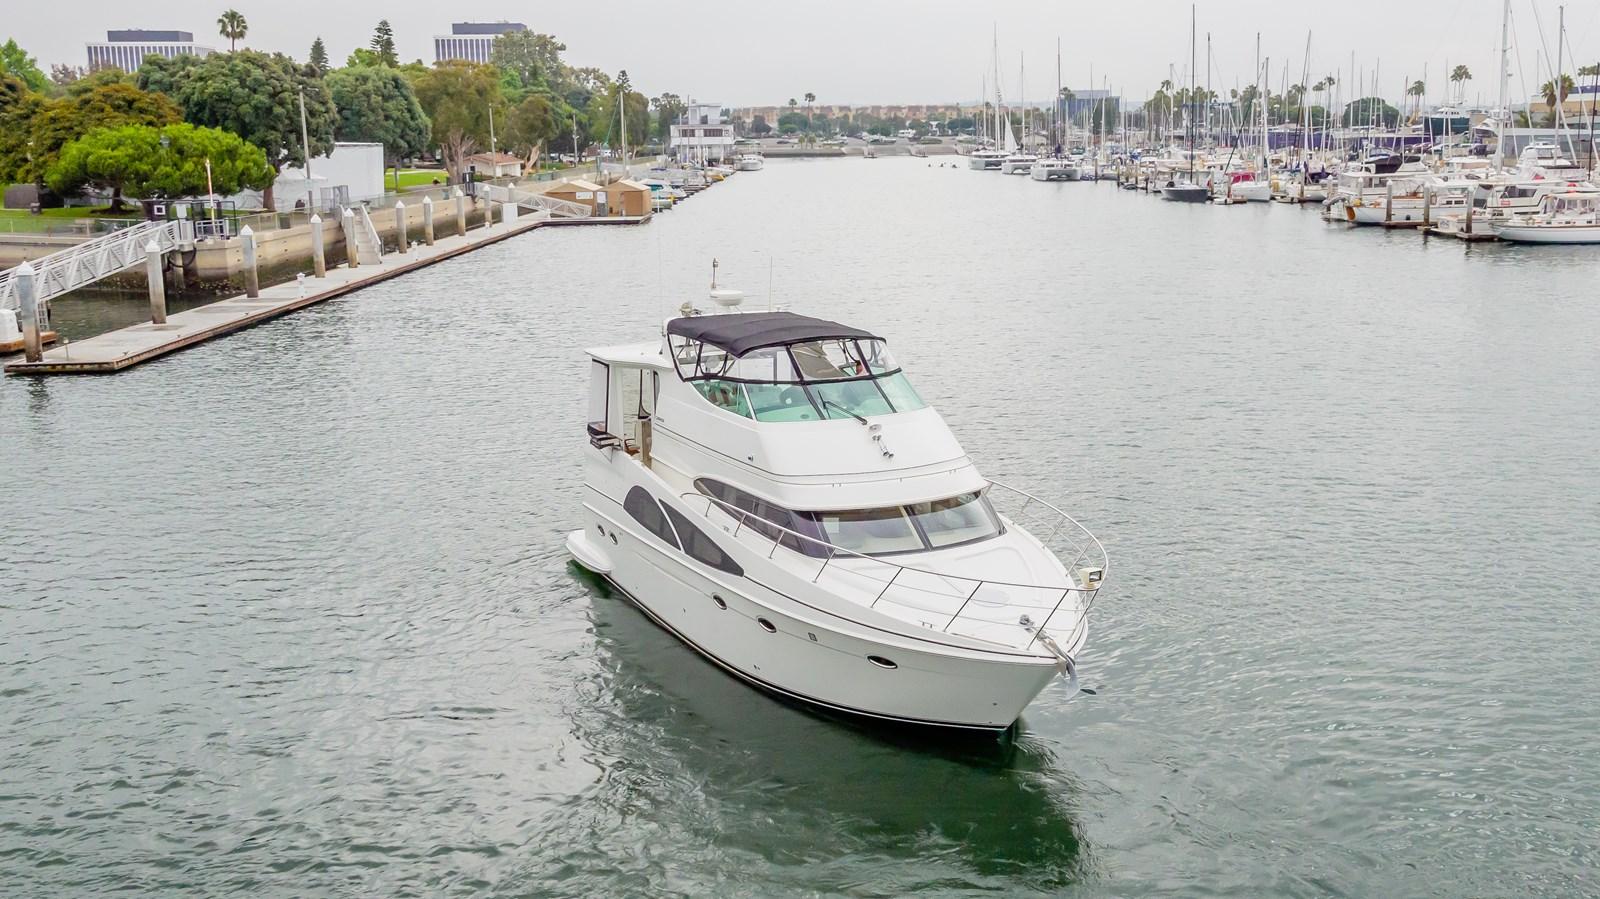 DJI_0037 2005 CARVER  Motor Yacht 2737792